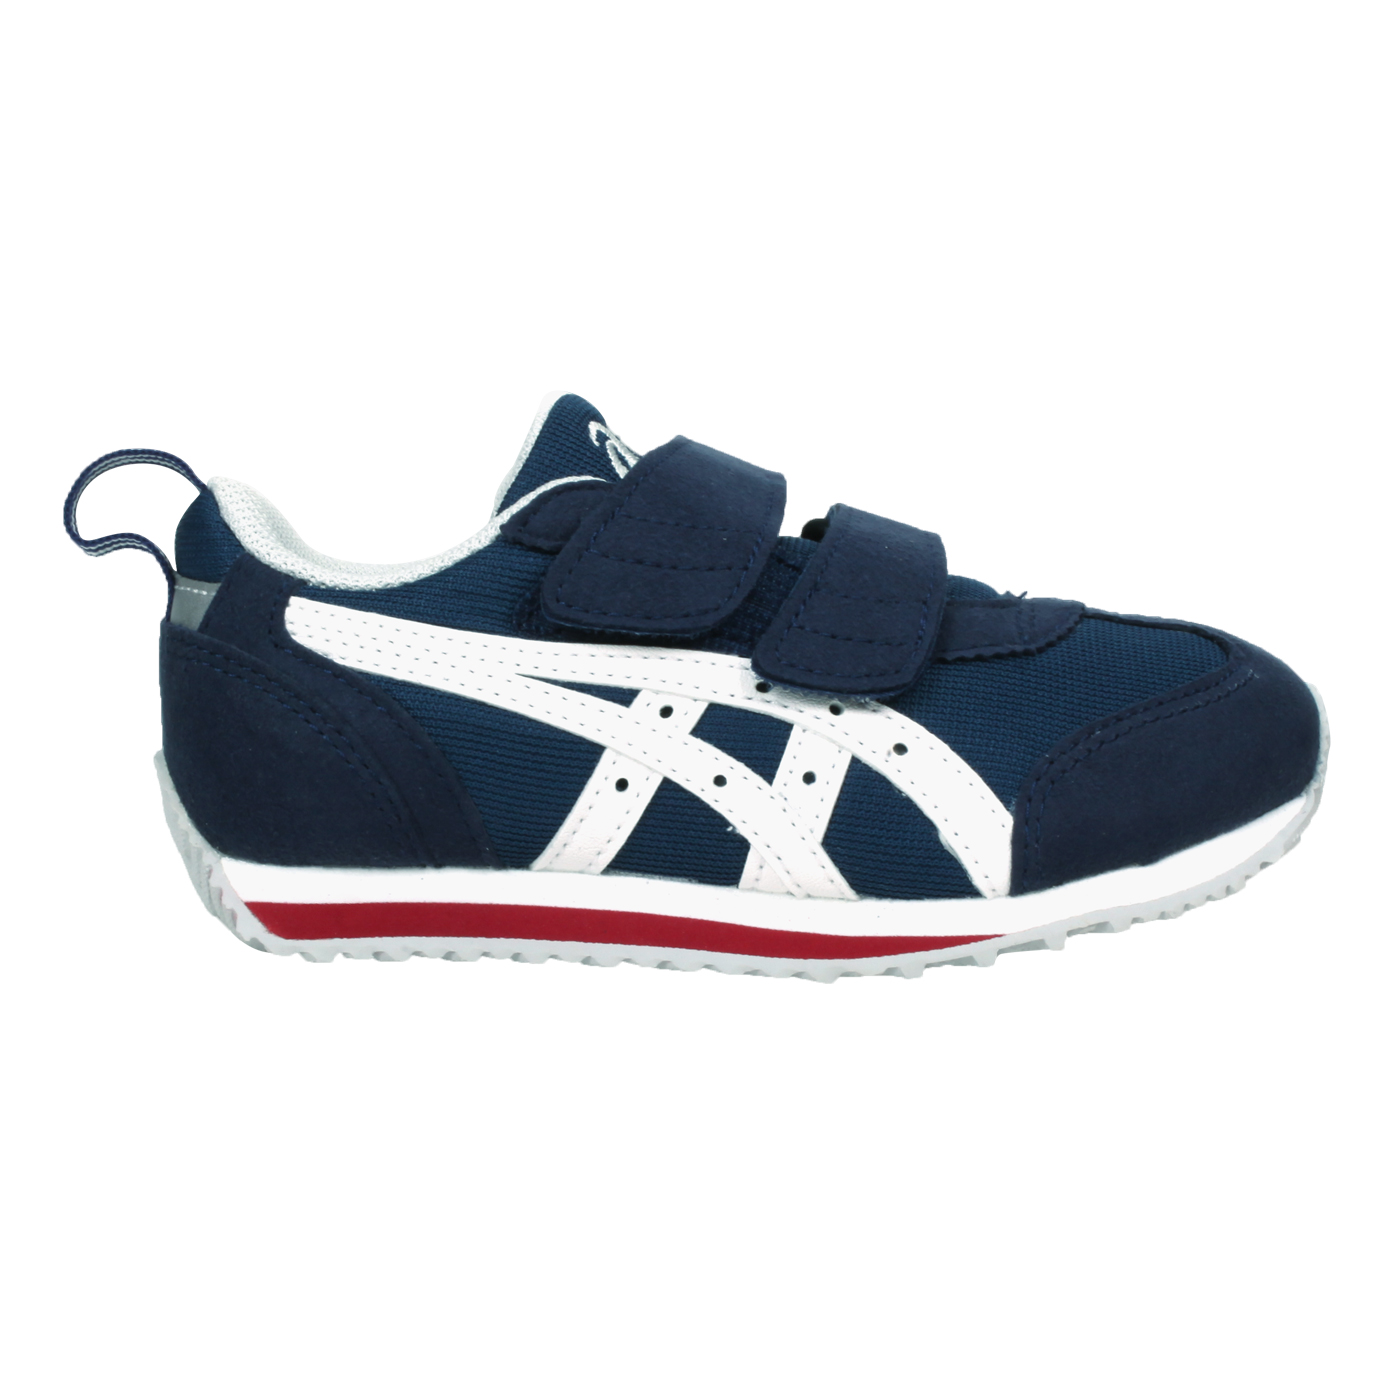 ASICS 中童運動鞋  @IDAHO MINI JP@TUM185-5001 - 深藍白紅